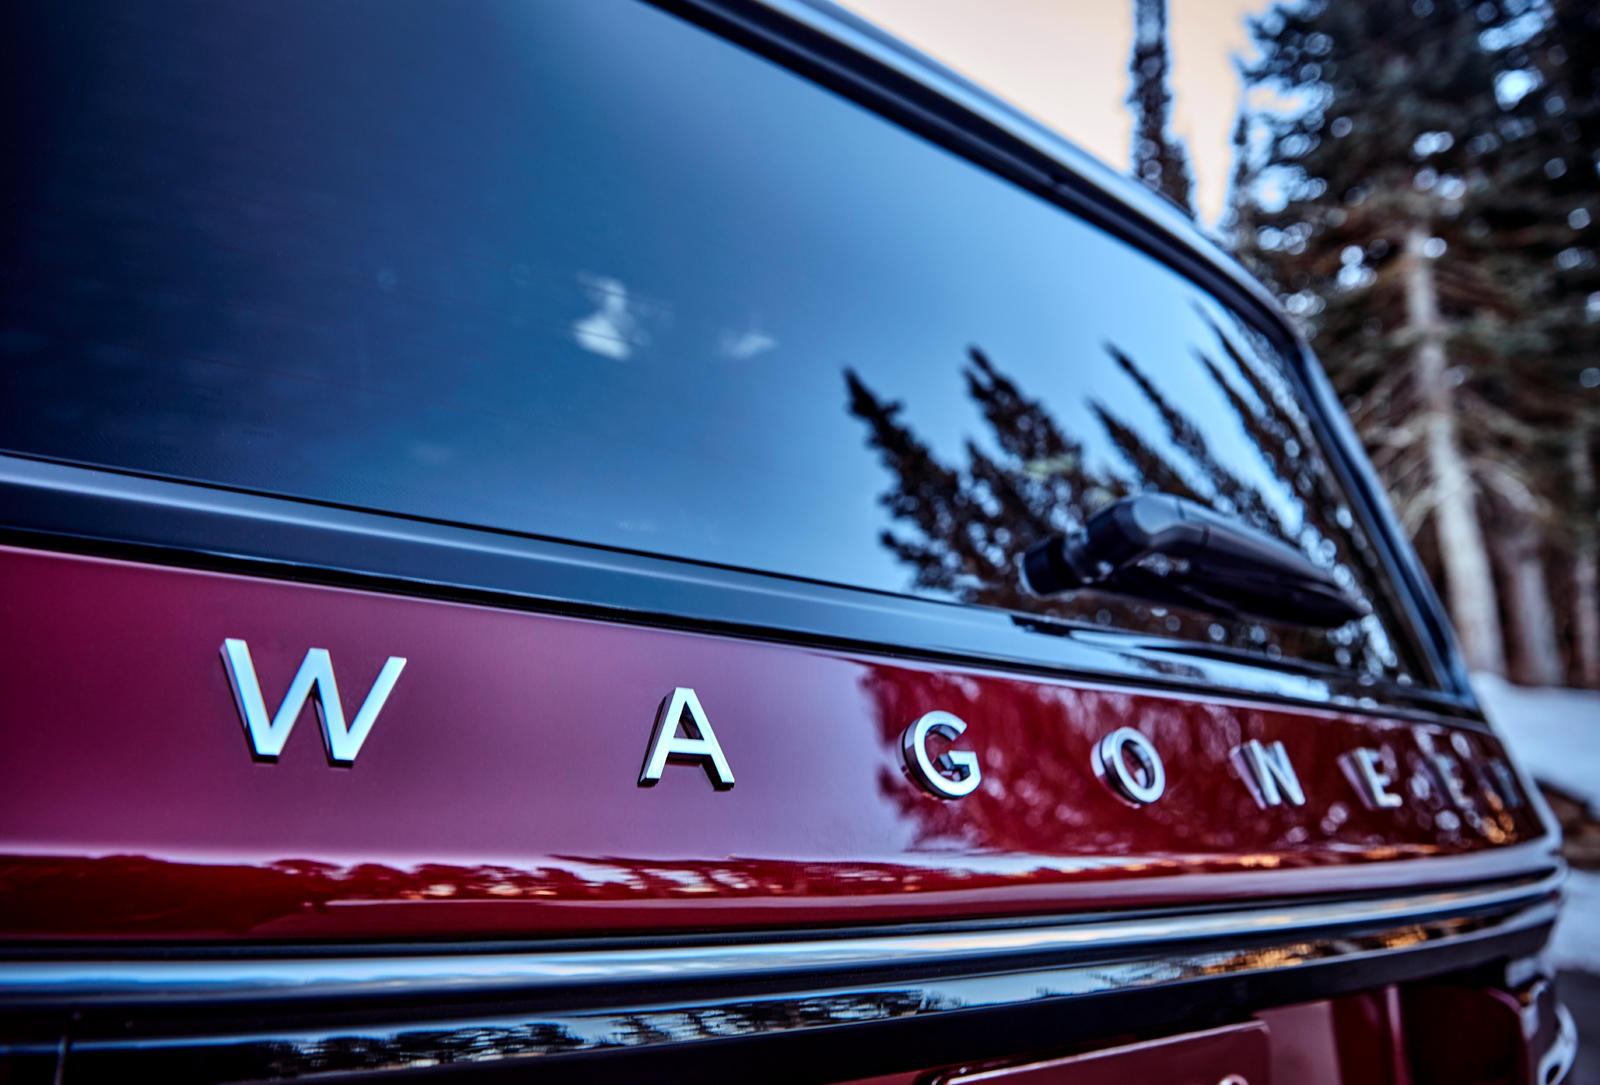 Jeep-Wagoneer-2022 (14).jpg